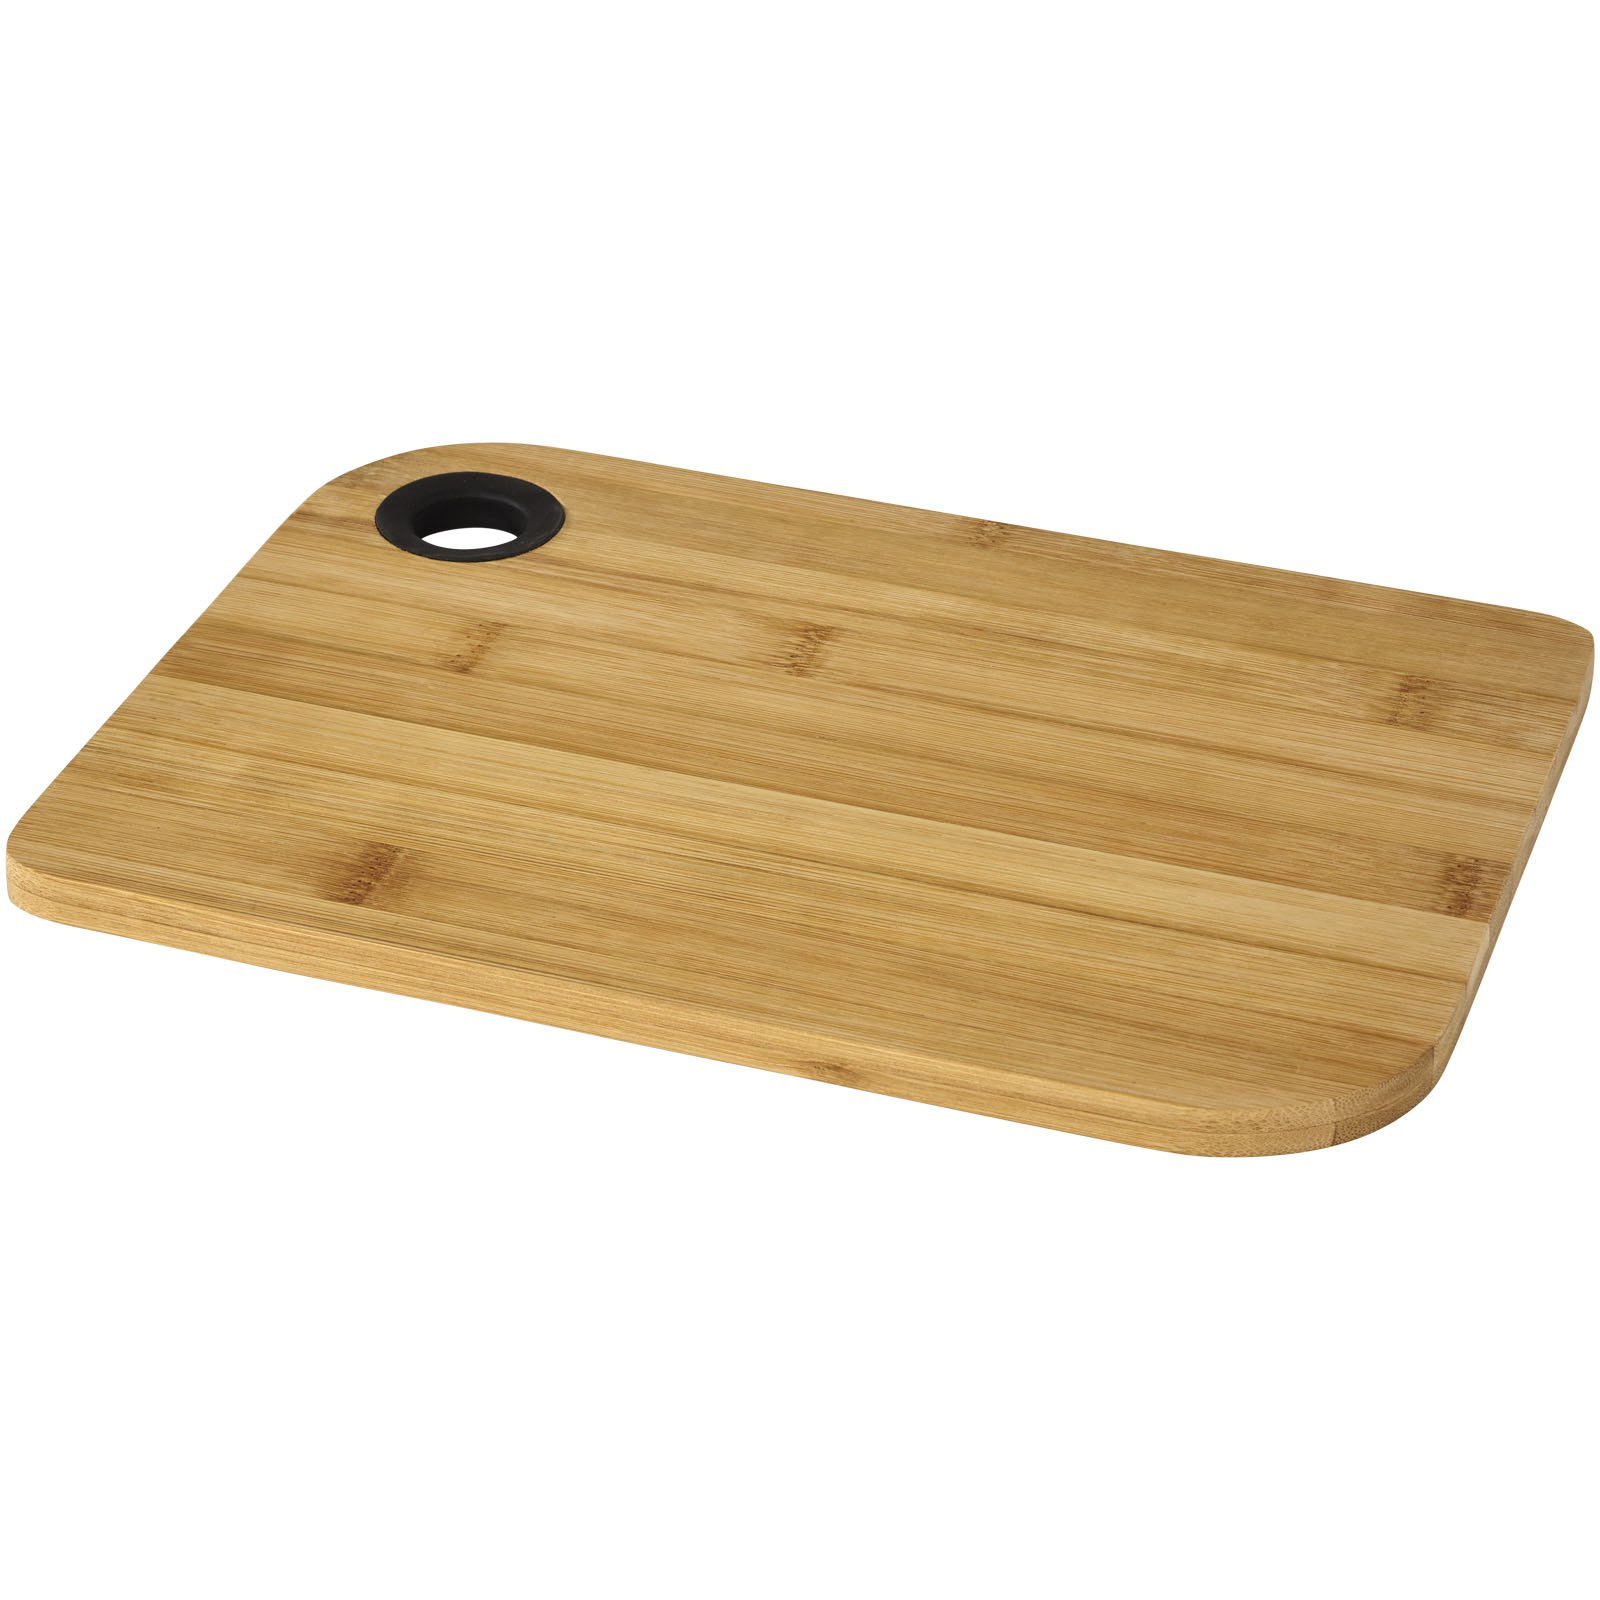 Seasons Main wooden cutting board